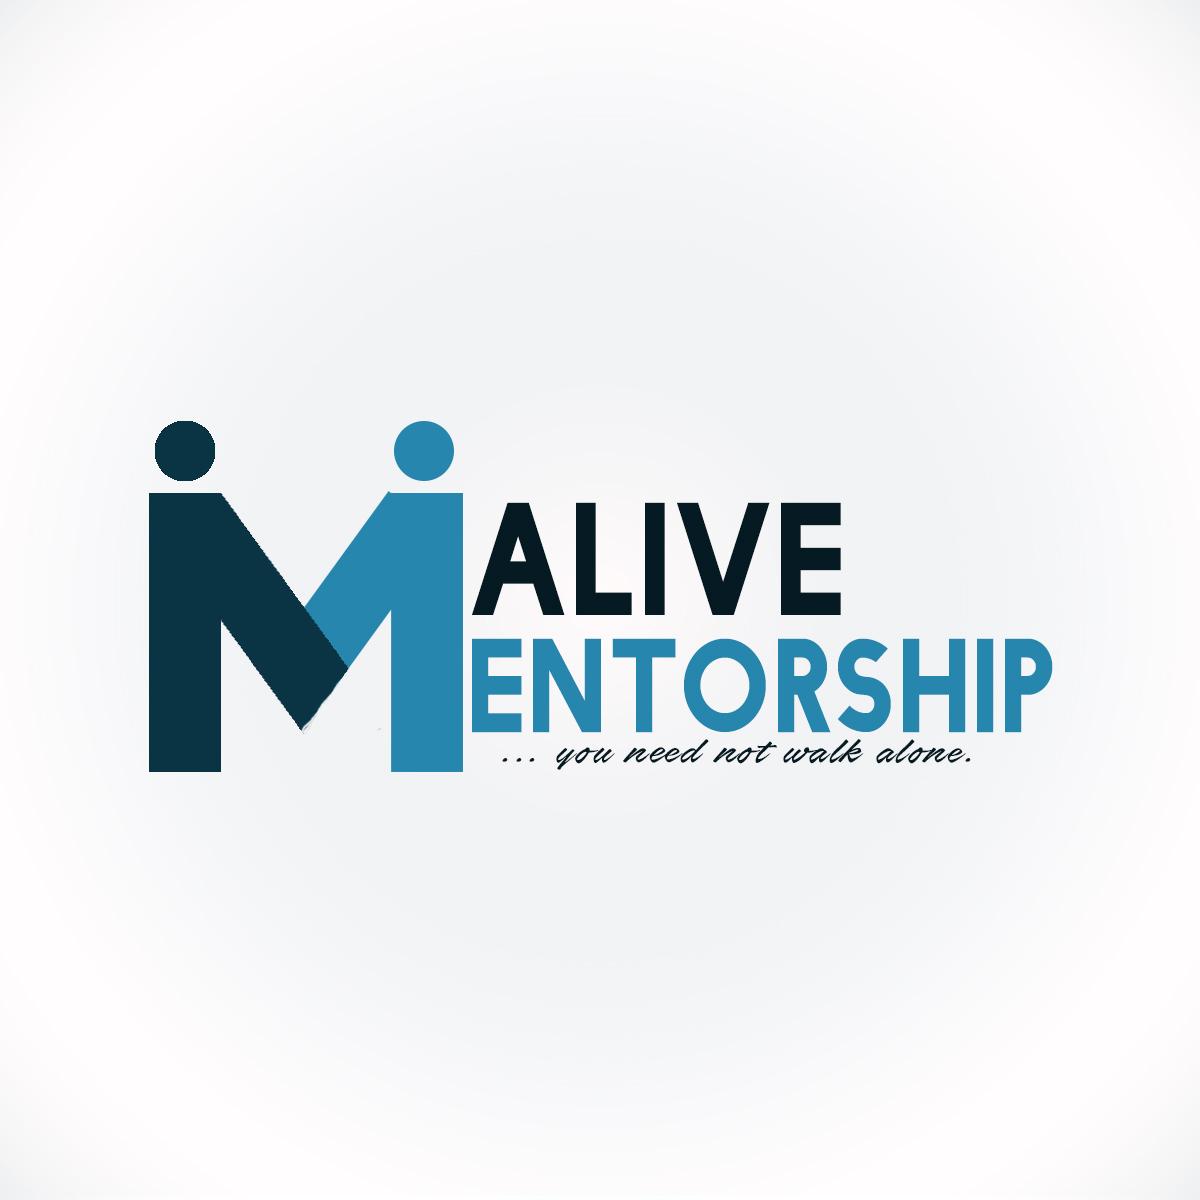 Alive Mentorship